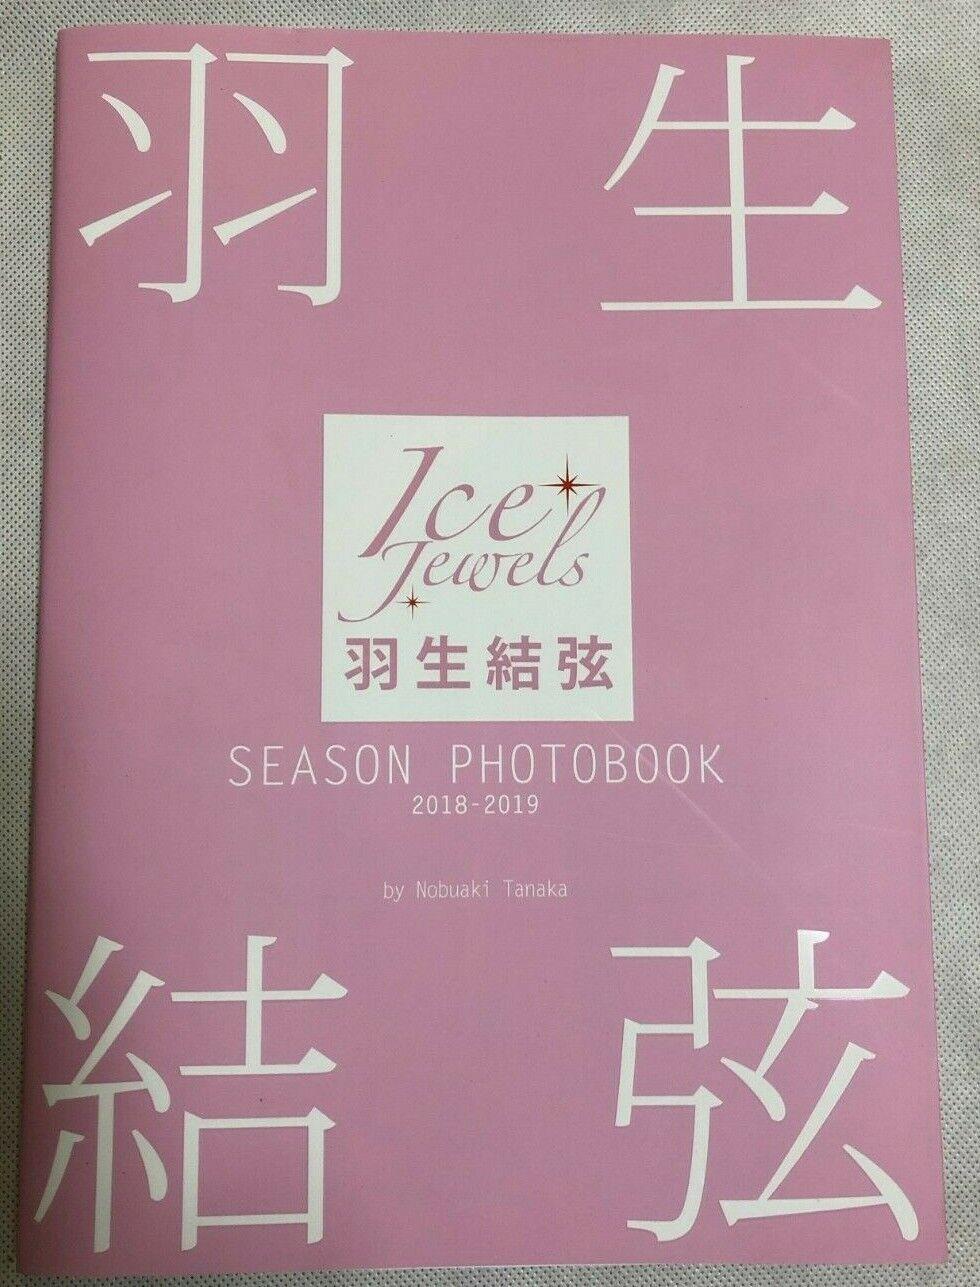 YUZURU HANYU SEASON PHOTO BOOK 2018-2019JAPAN Figure Skating NEW